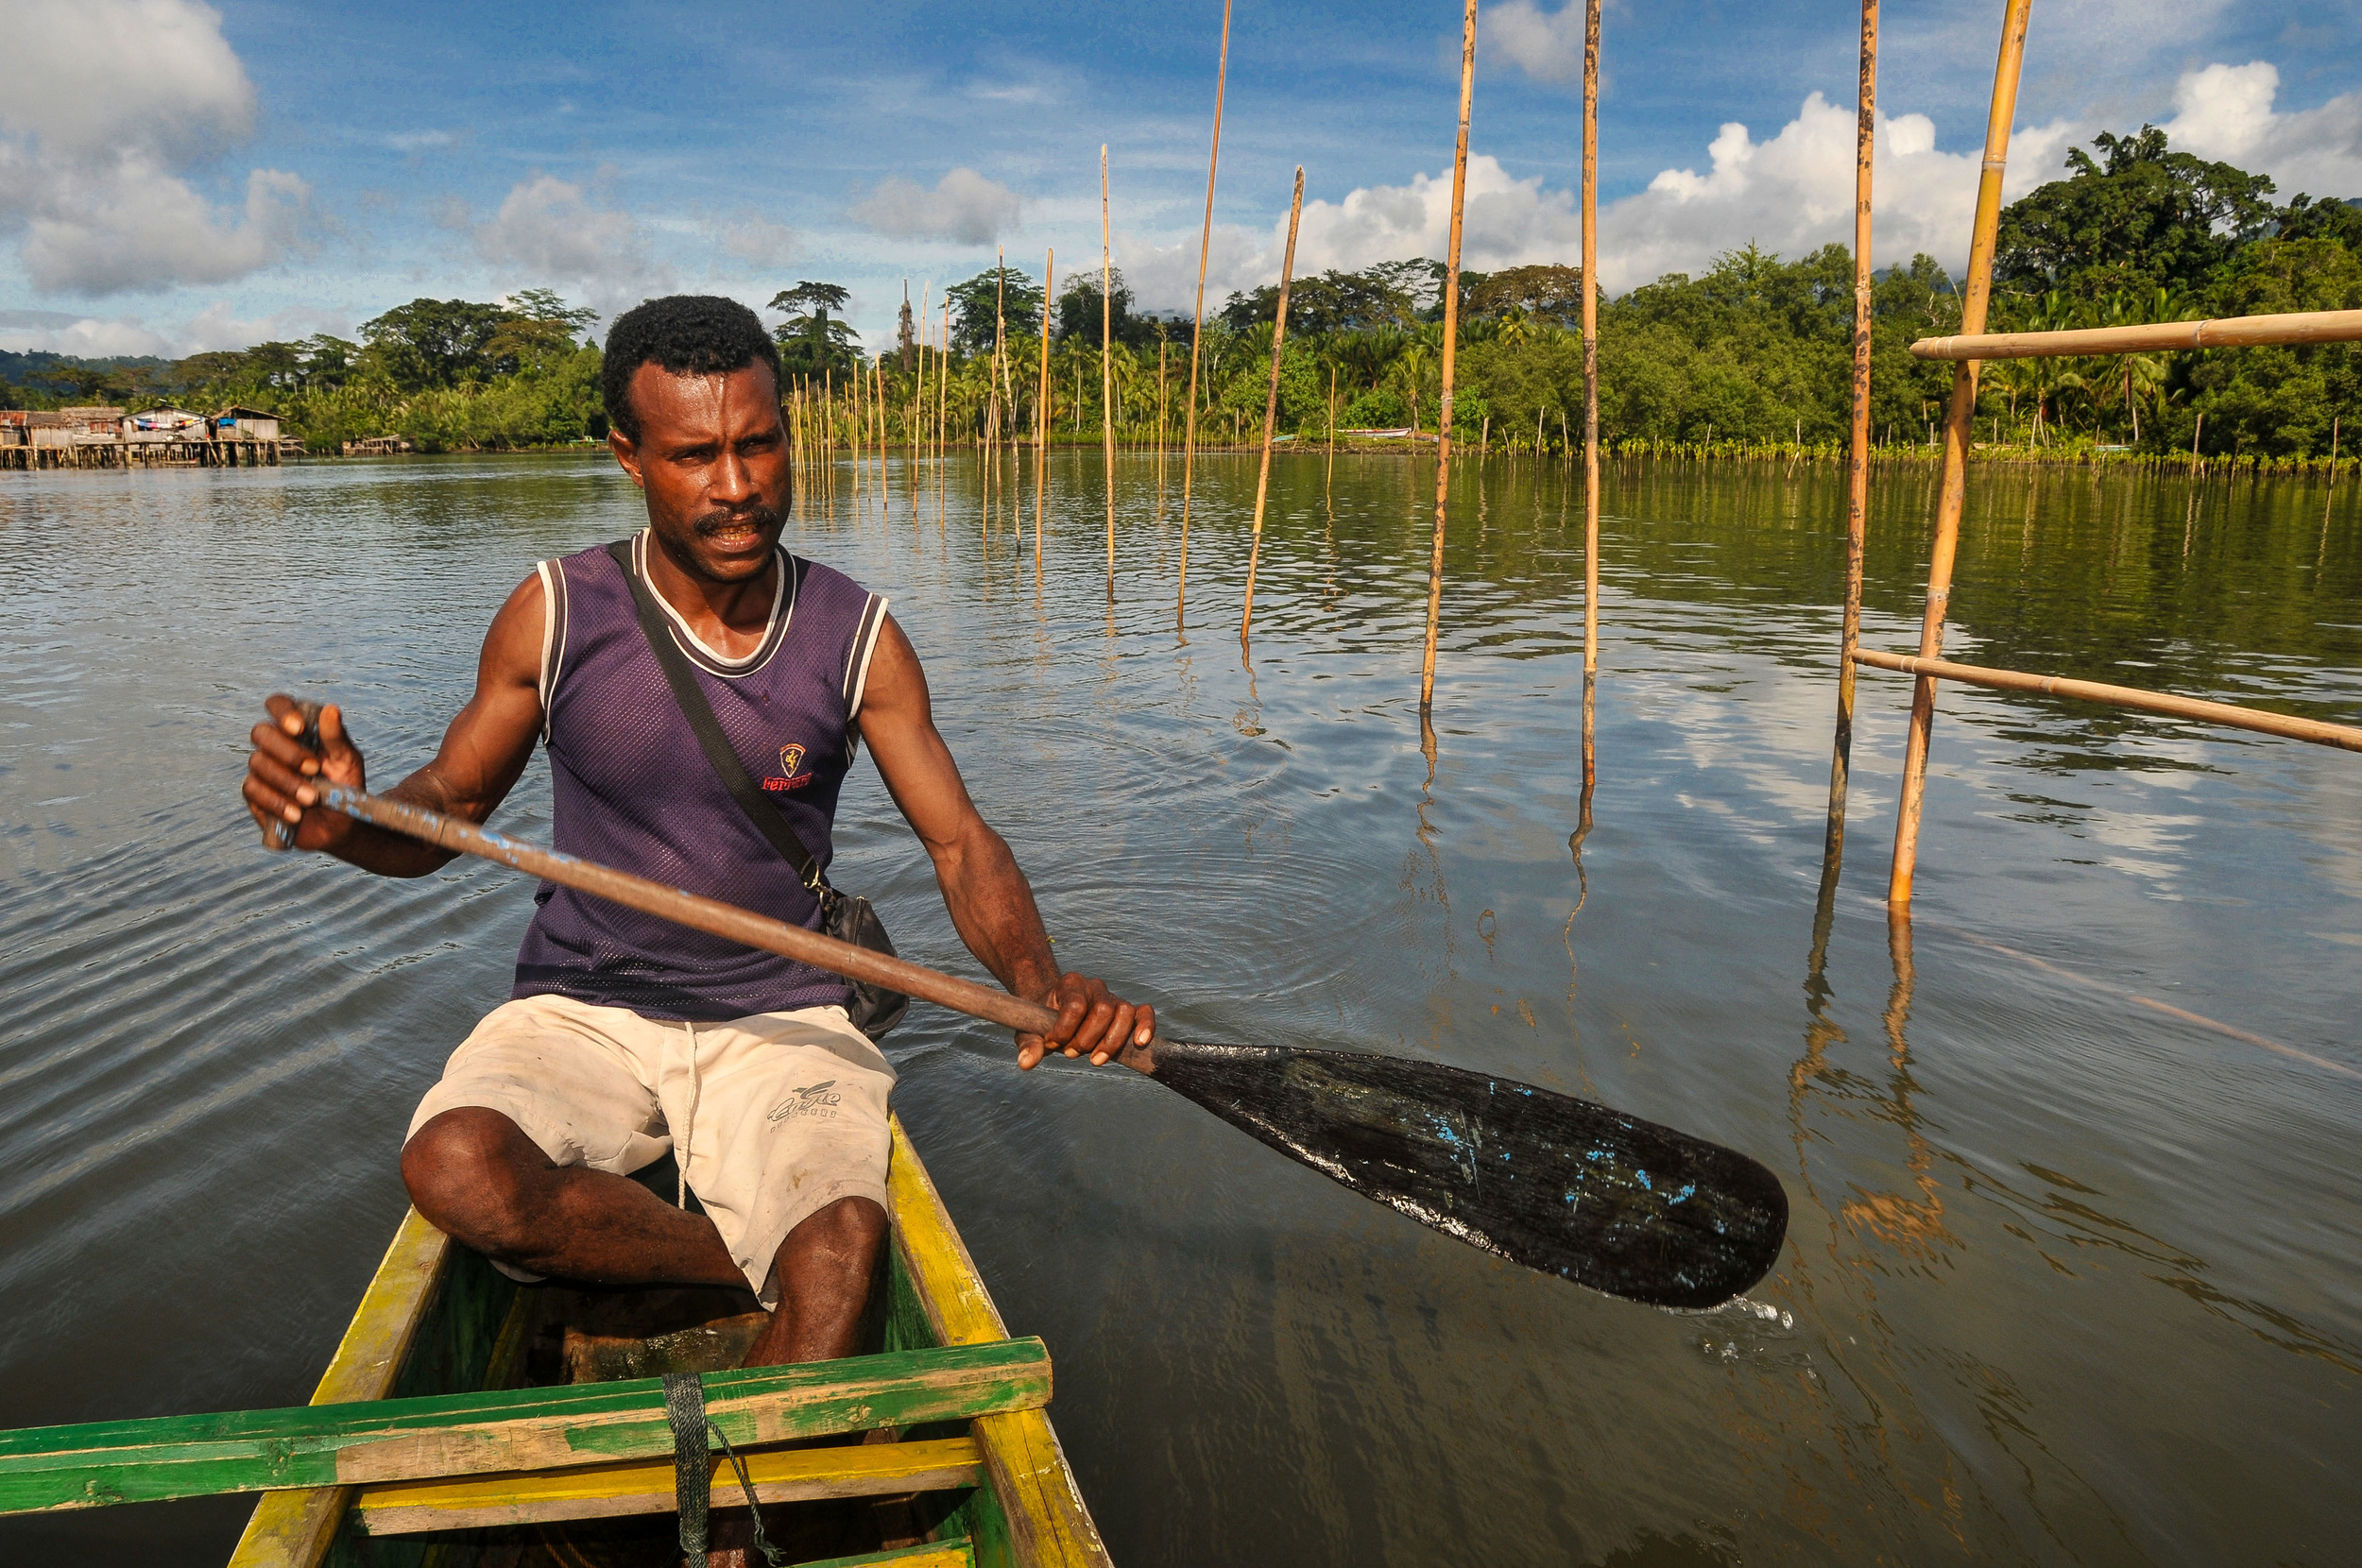 Paddling around a mangrove restoration area.